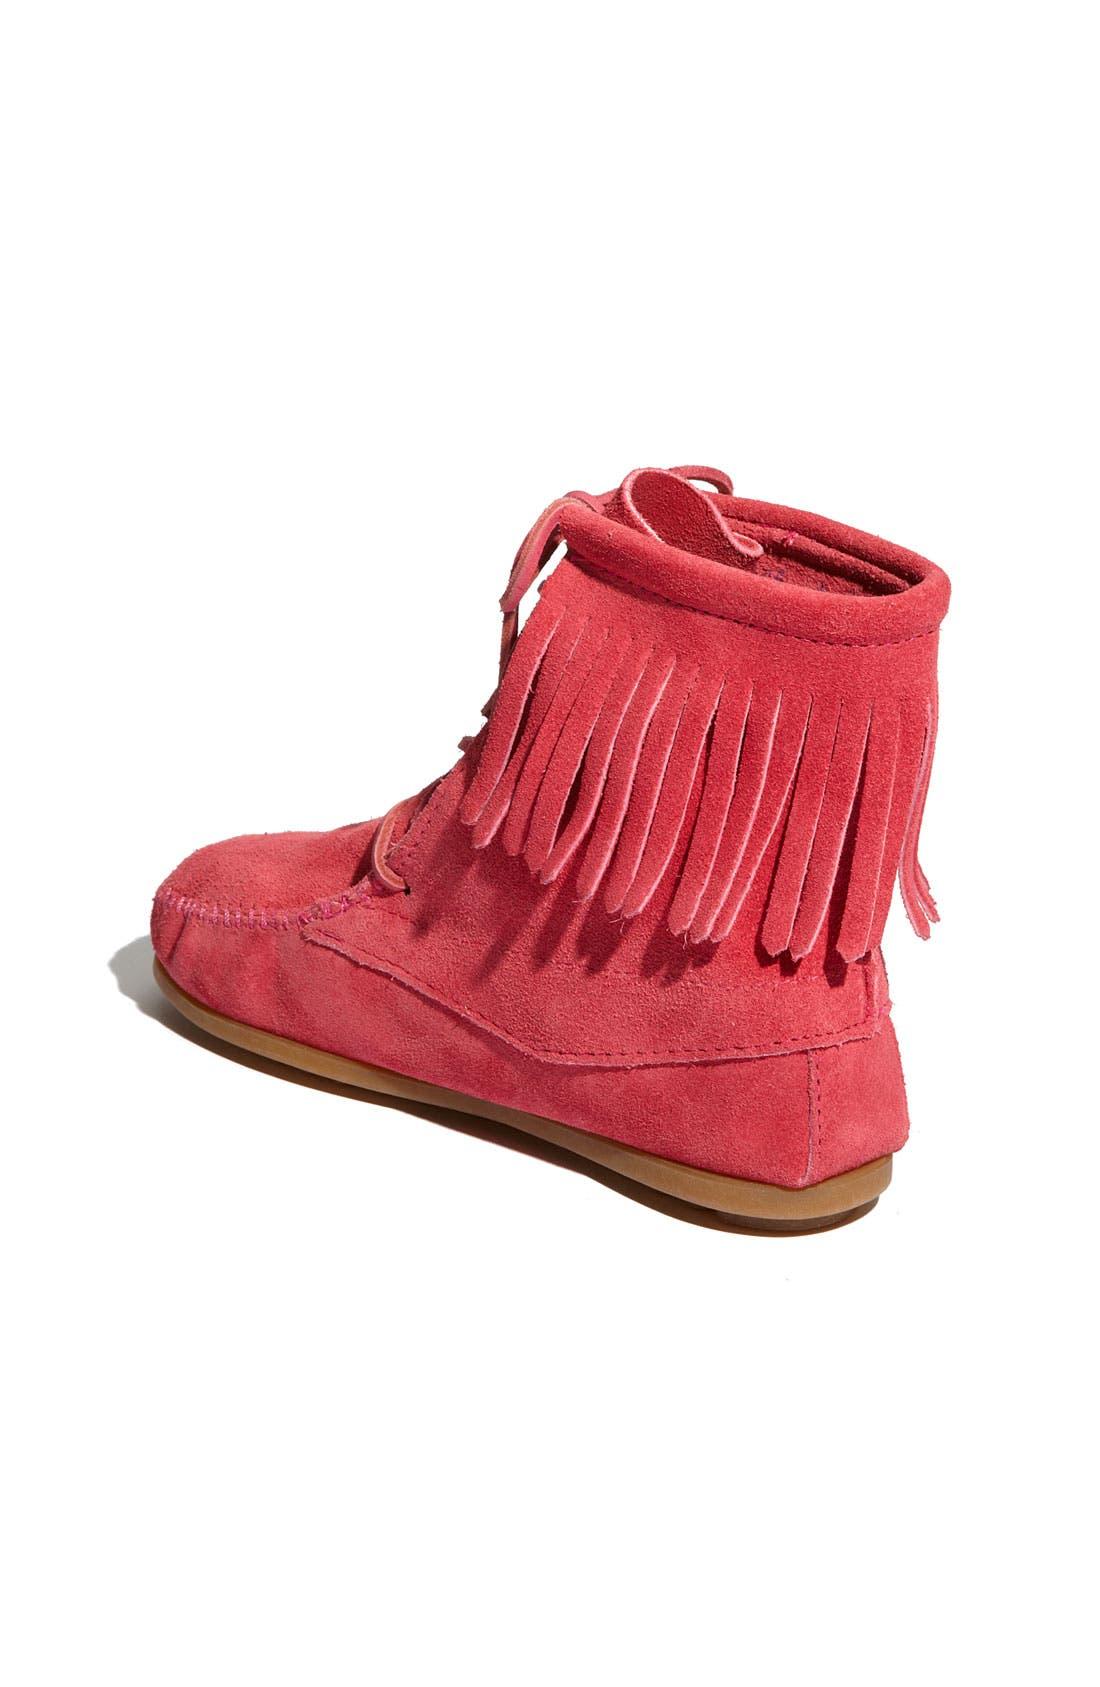 Alternate Image 2  - Minnetonka Lace-Up Boot (Walker, Toddler & Little Kid)